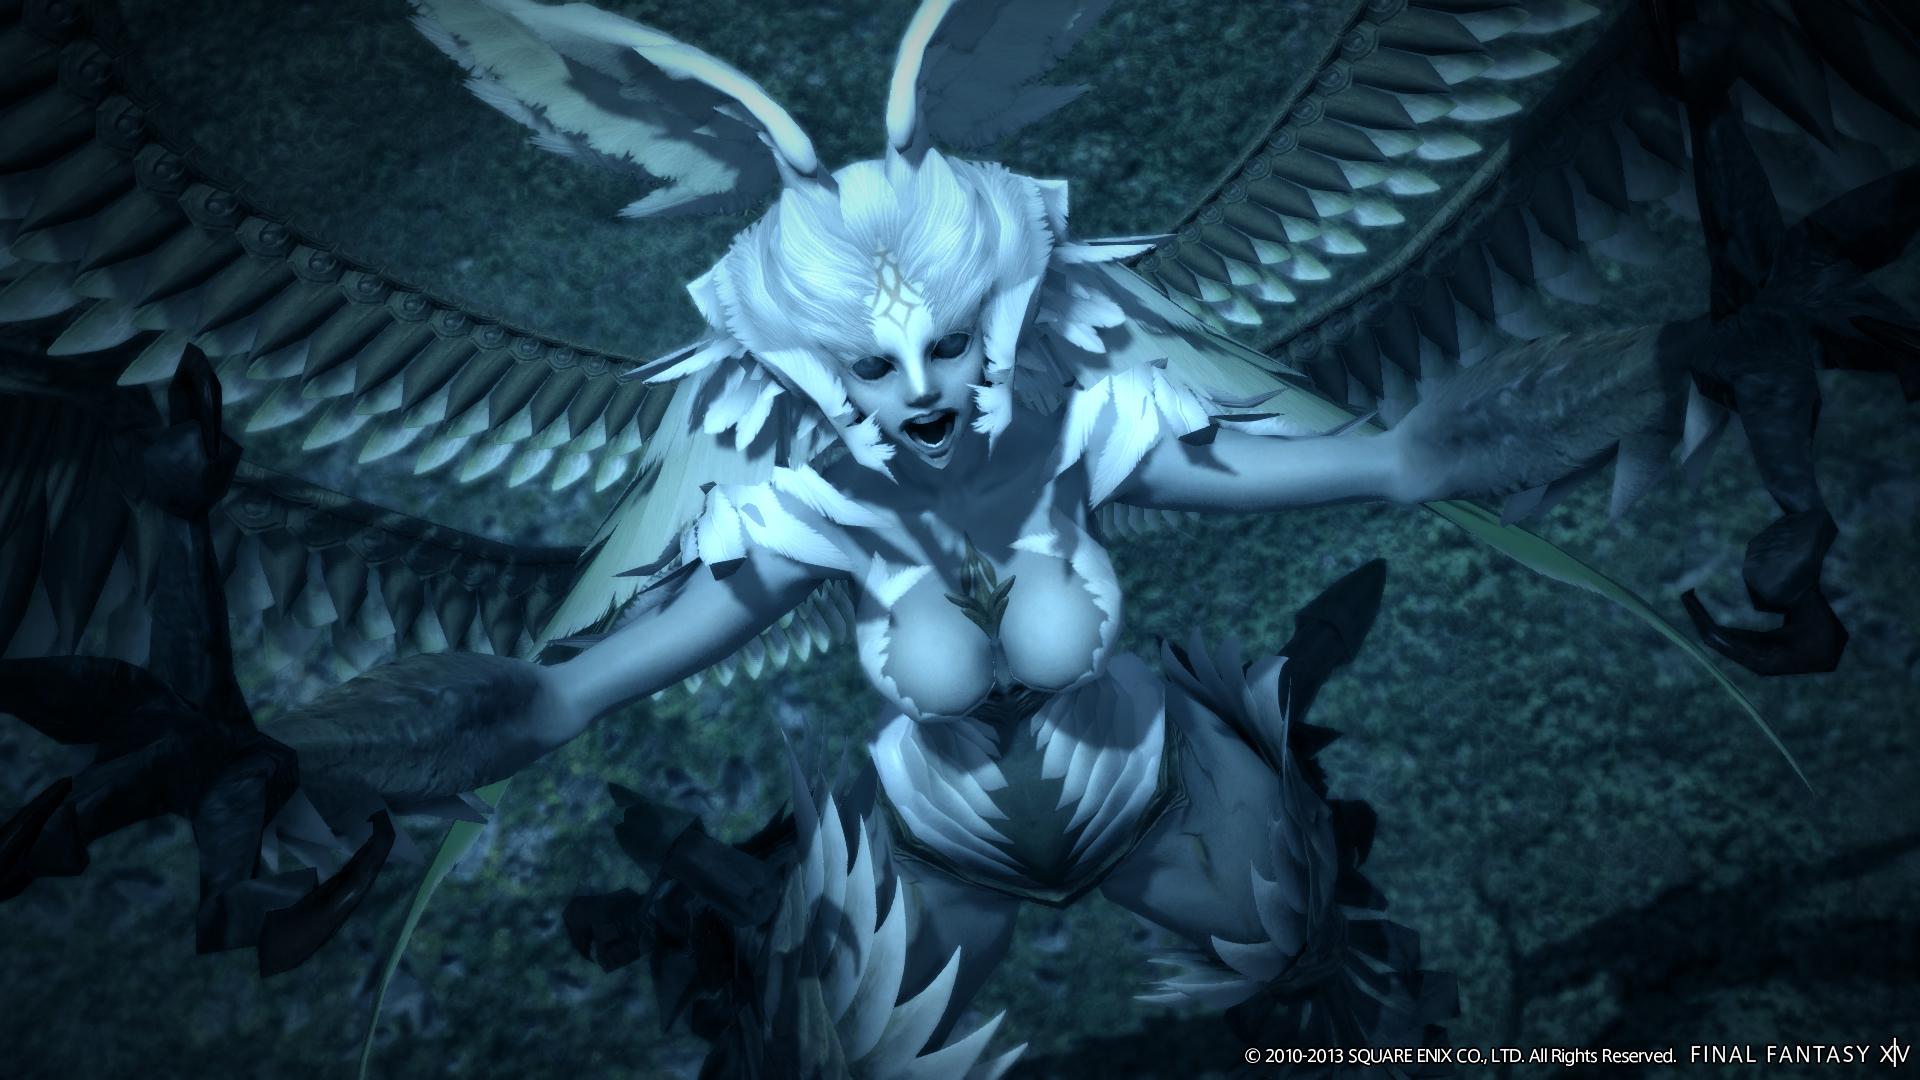 Final Fantasy 14 Online A Realm Reborn PC 1920x1080